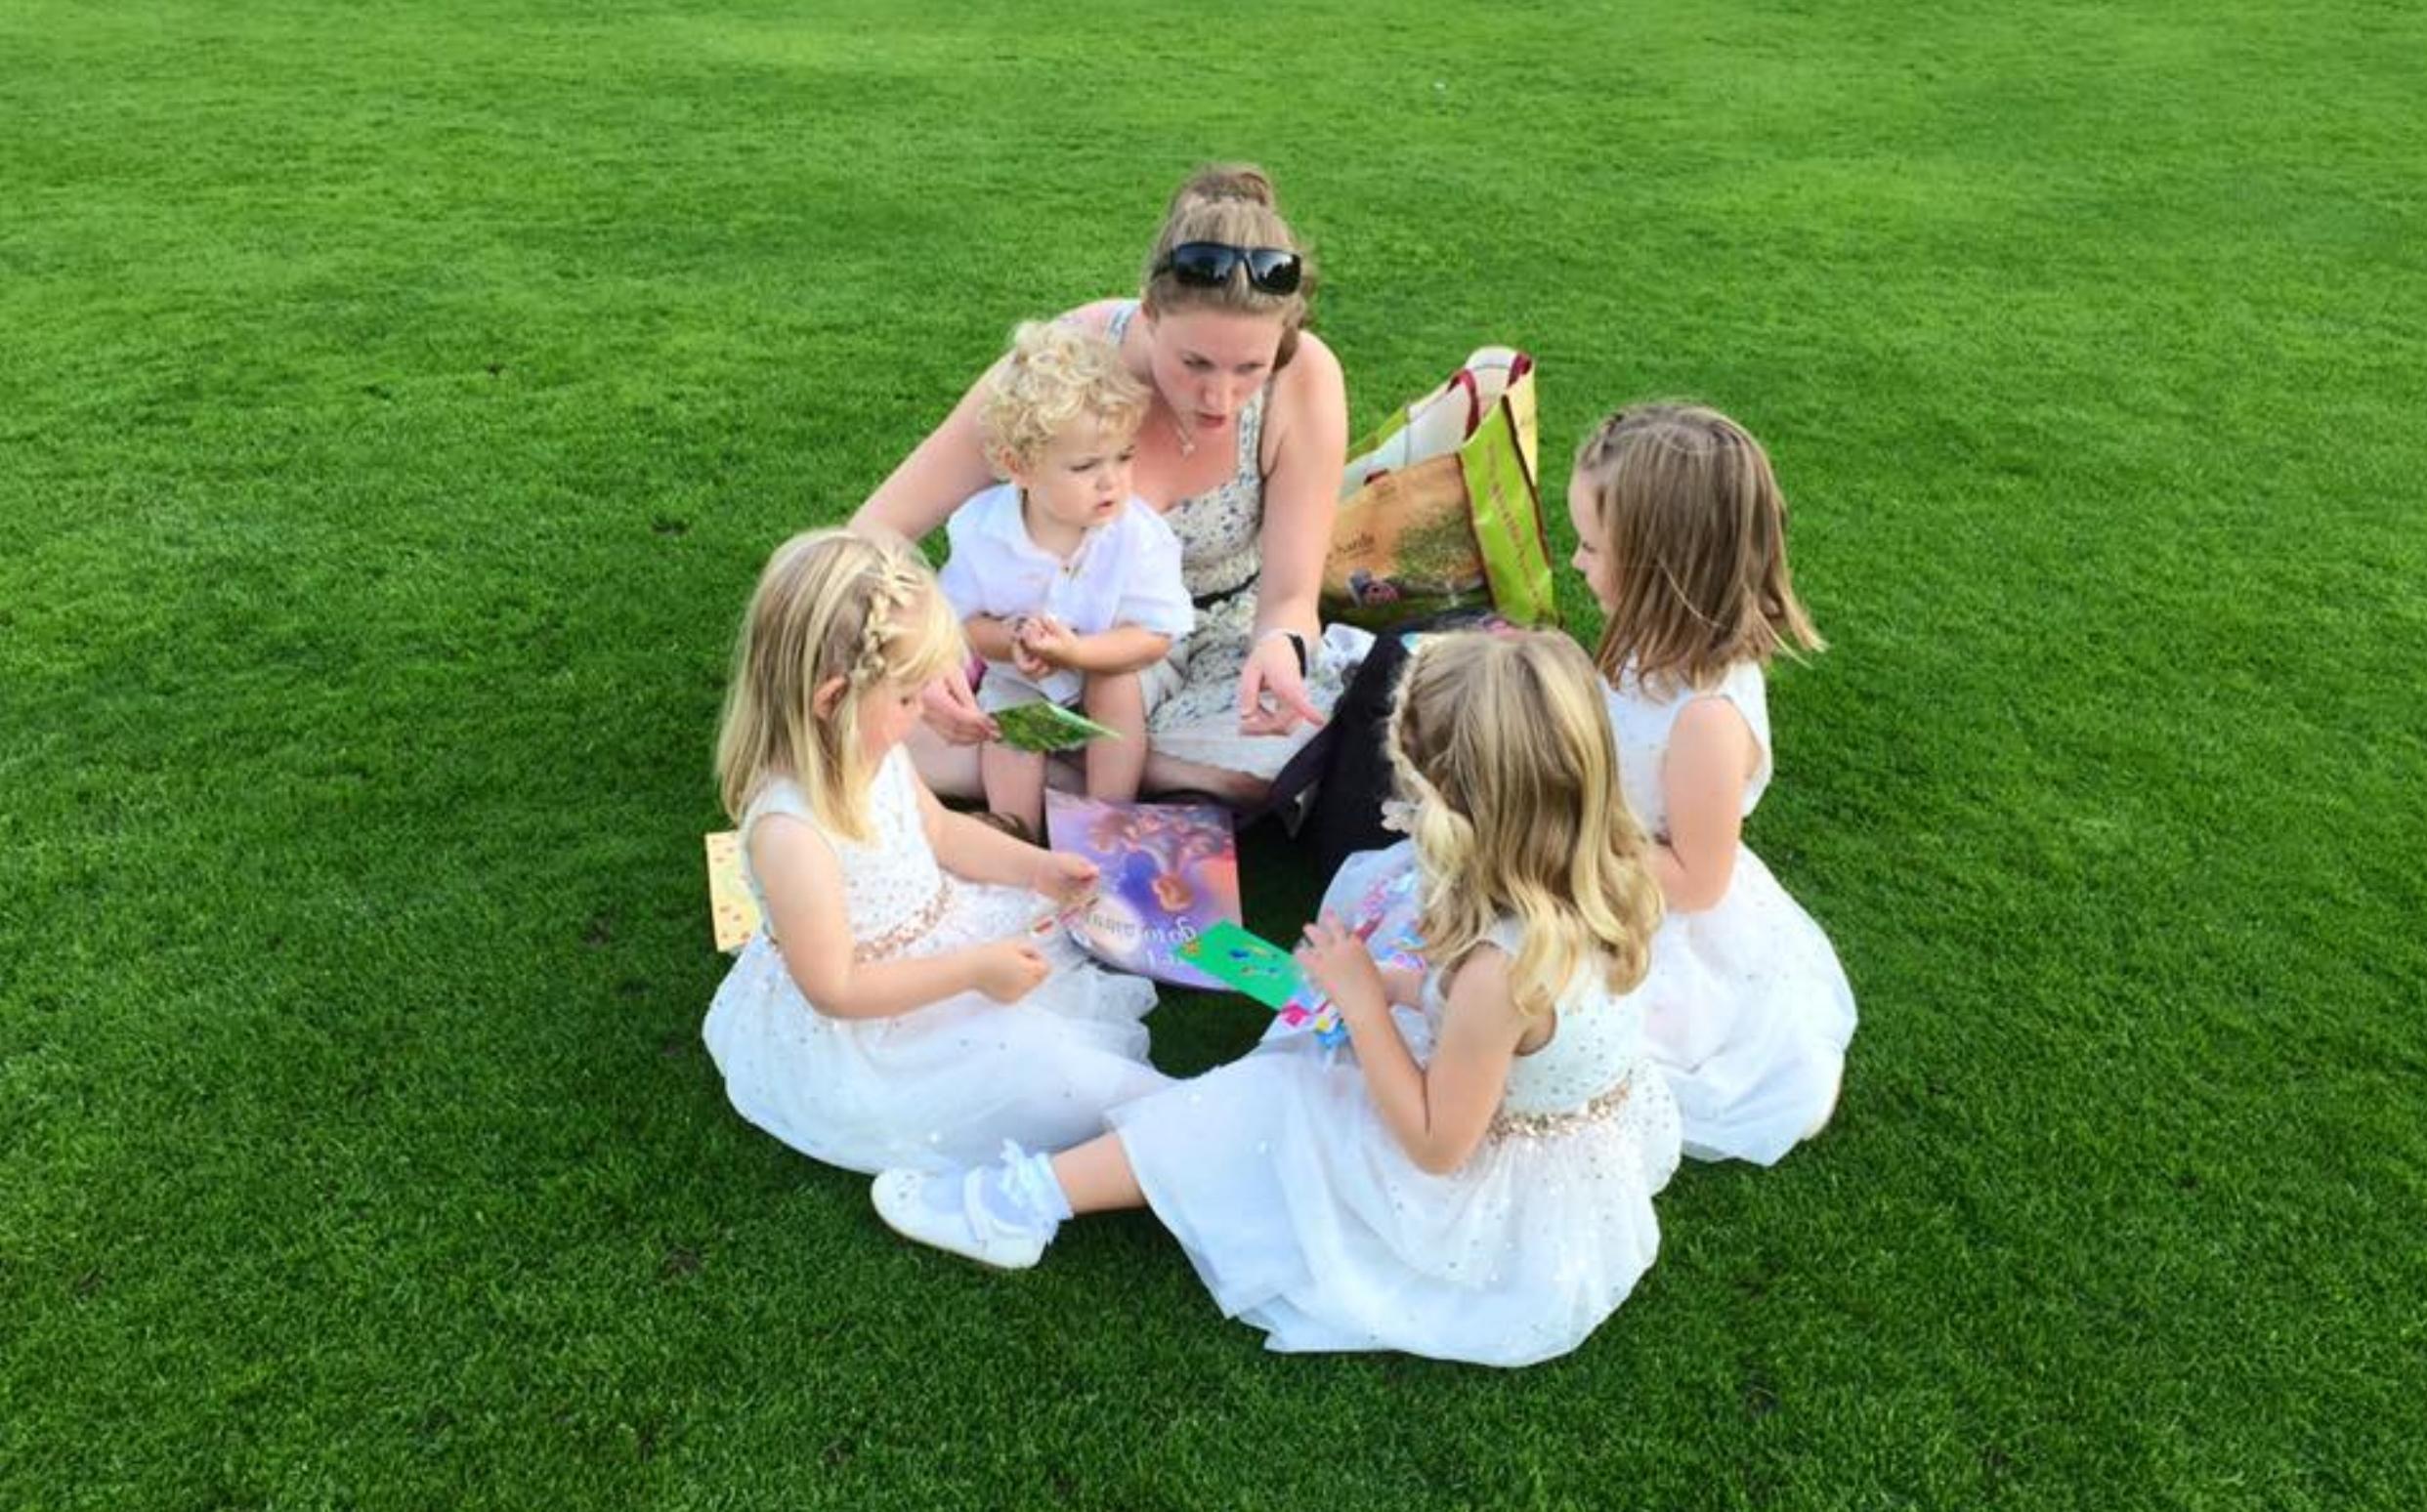 Walmsley+wedding+group+on+grass.jpg